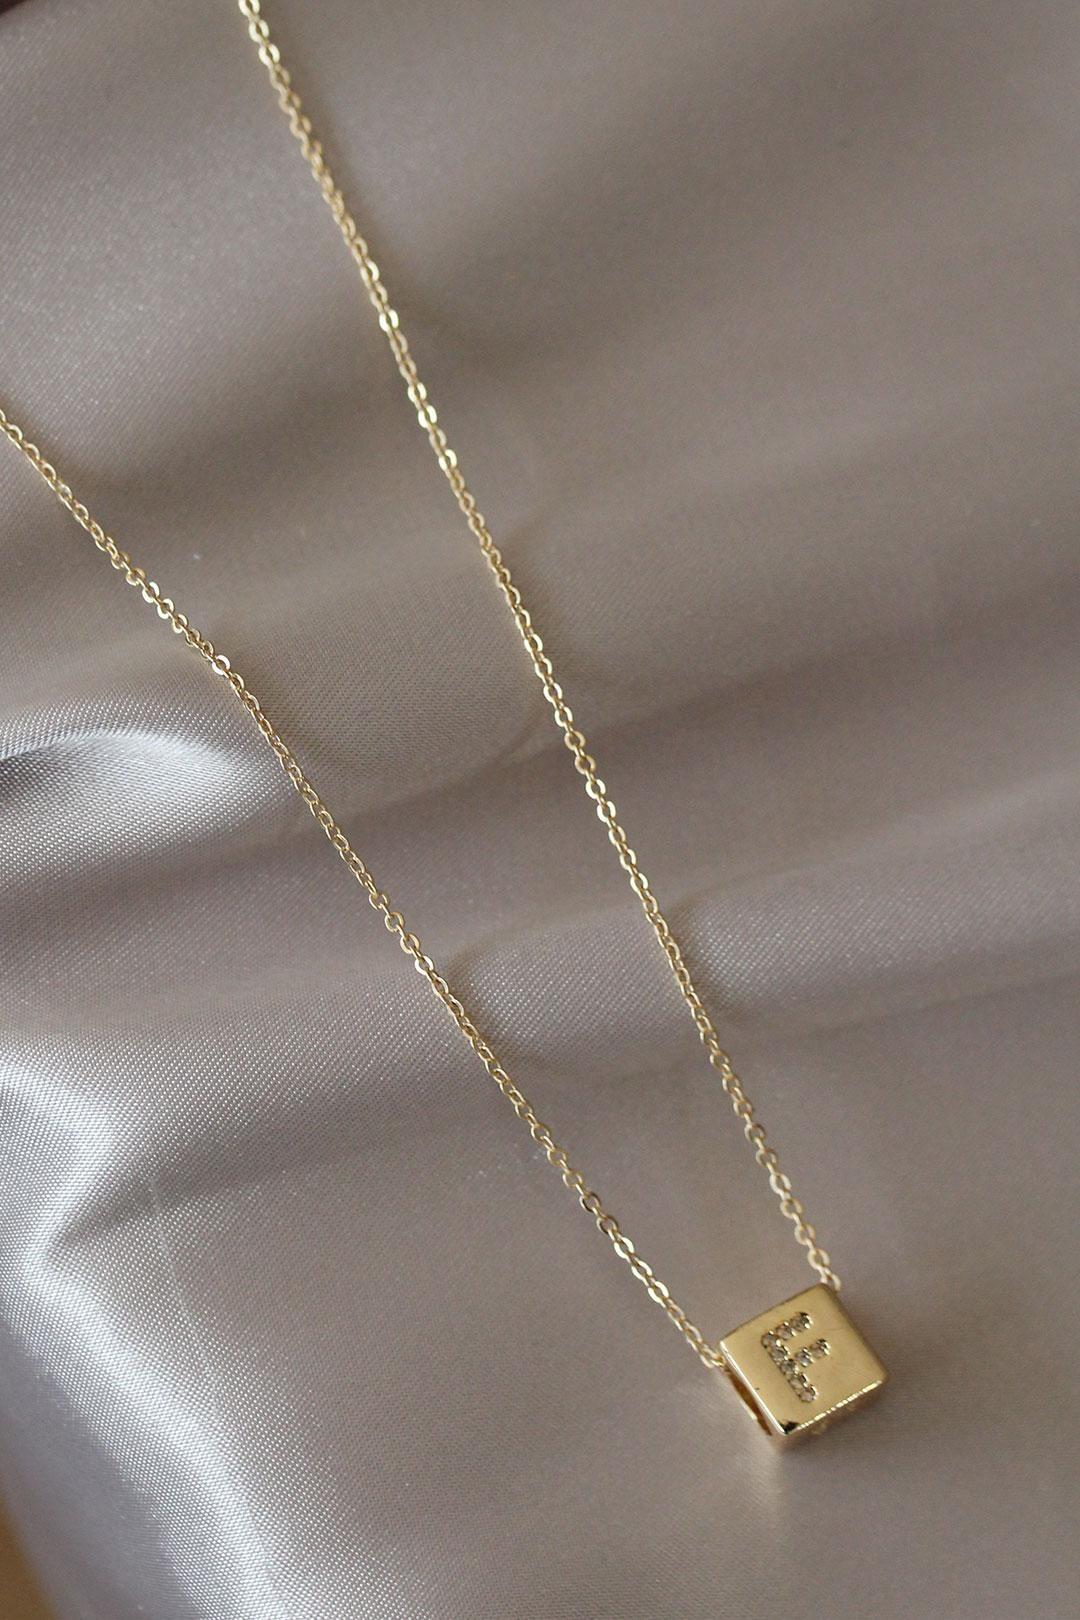 Küp Model Gold Renk Zirkon Taşlı F Harfli Kolye